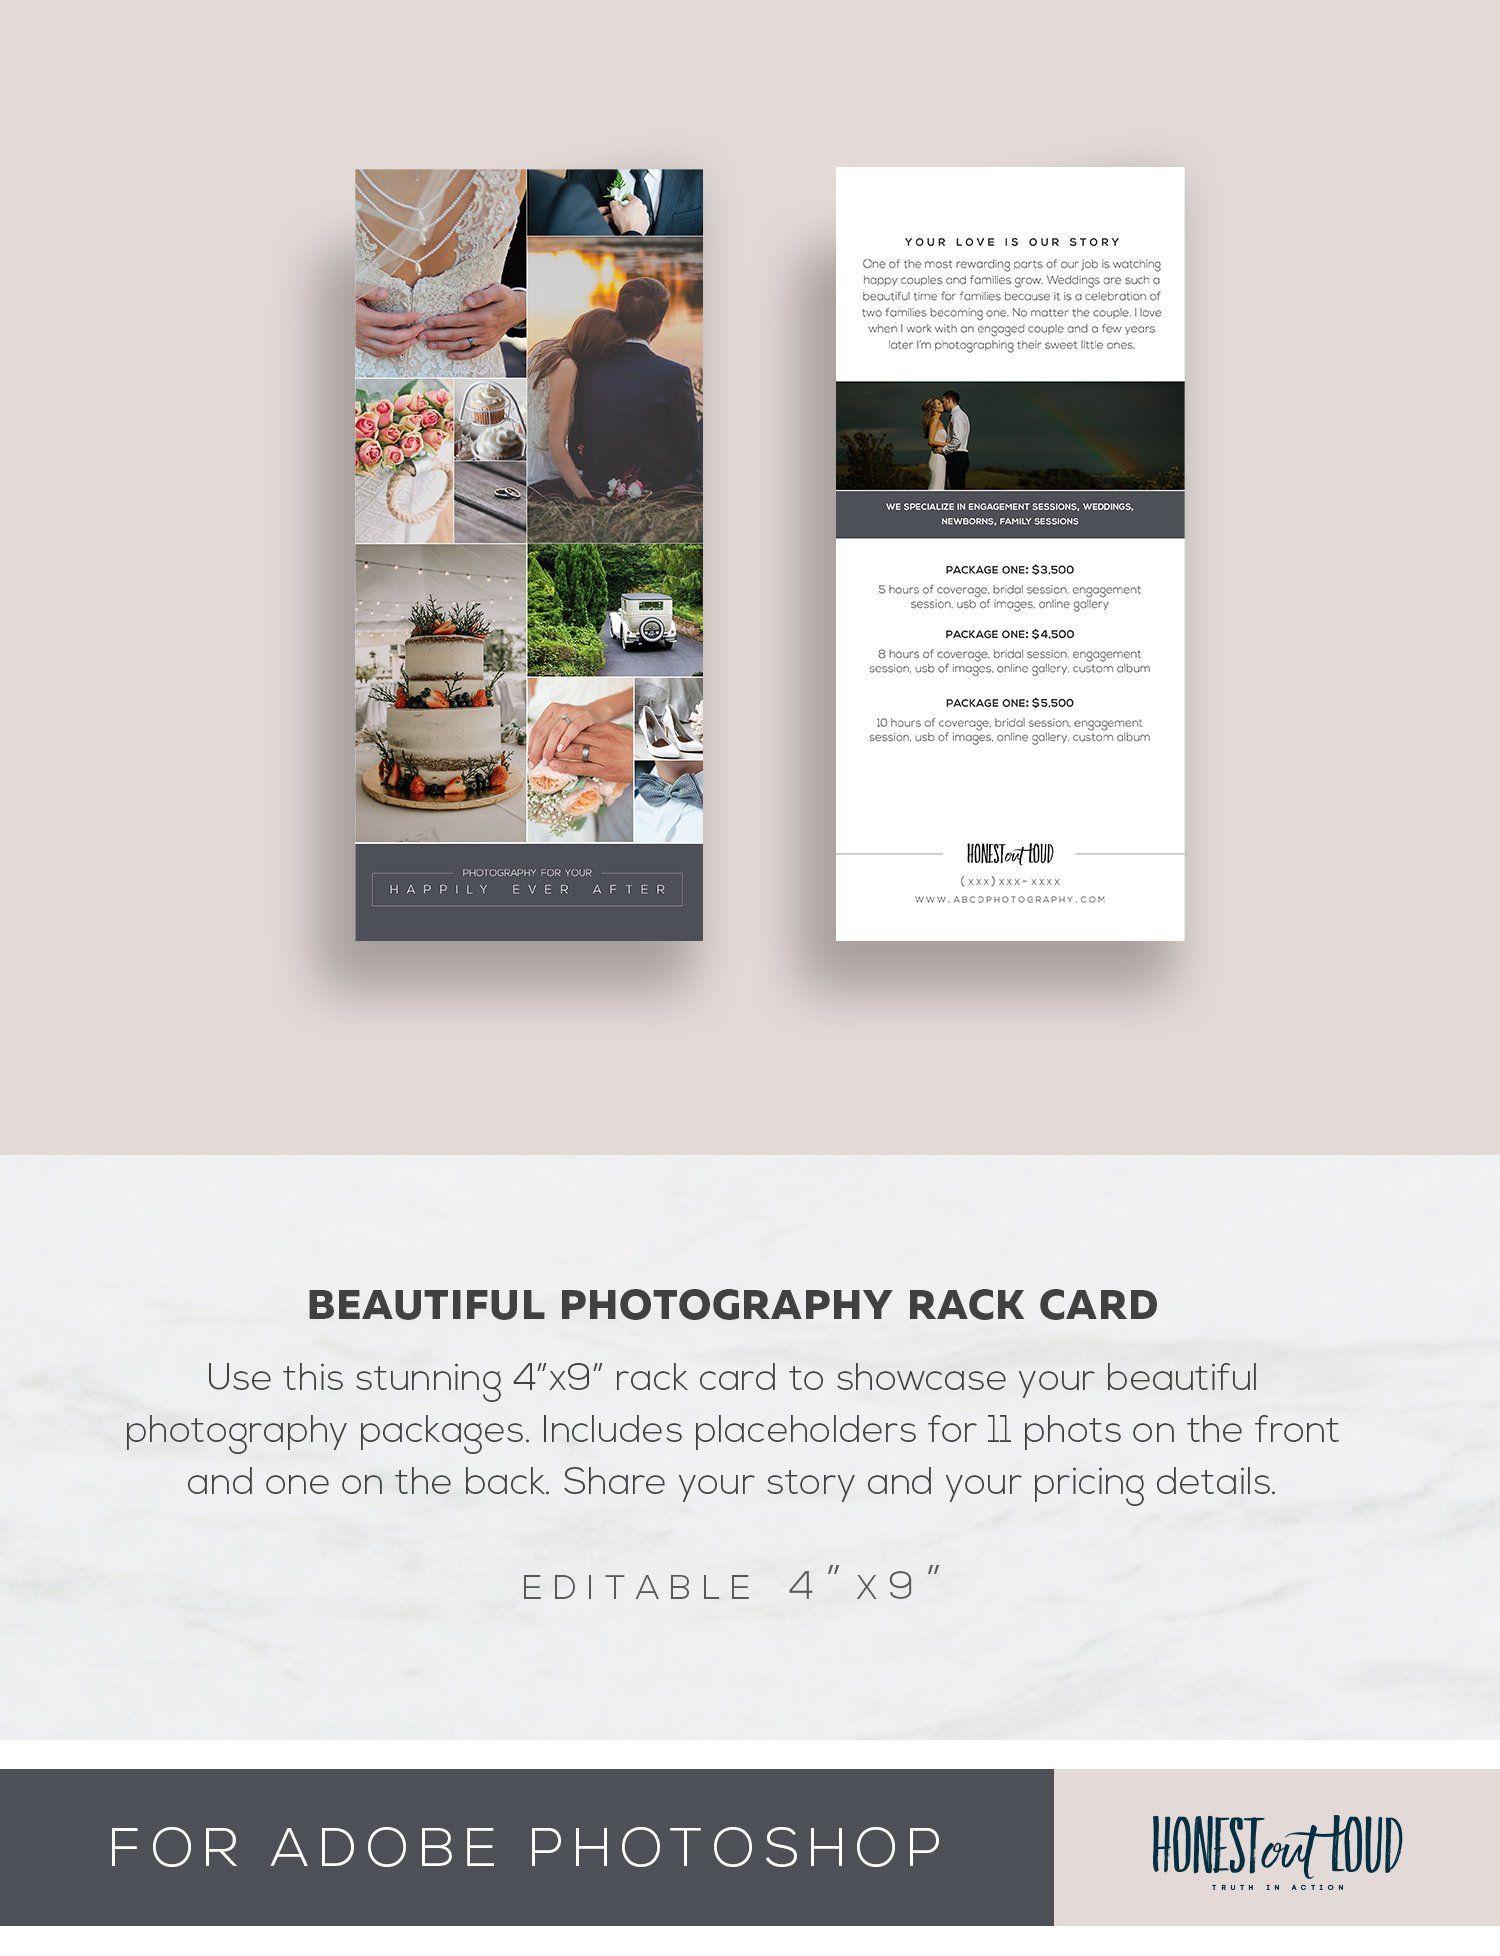 Wedding Photography Rack Card Template 4x9 Photoshop Instant Etsy Rack Card Templates Rack Card Rack Cards Design